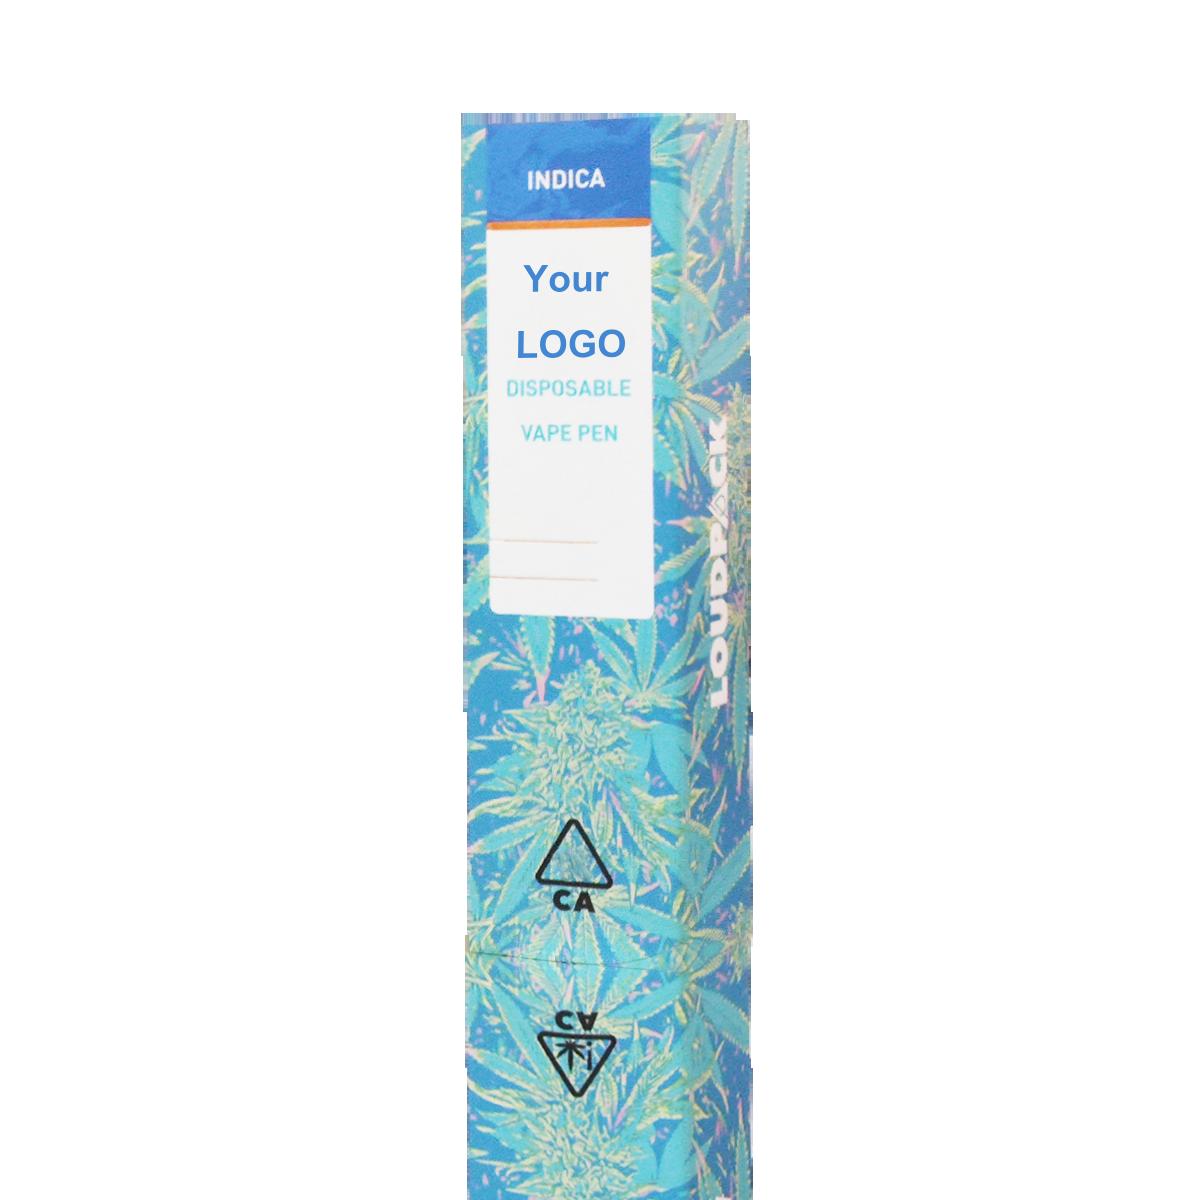 Cbd Pod Vaper Kit Cartridge Oil Filter Isolate Wax Hemp Gummies Childproof Disposable Vape Pen Child Resistant Box Packaging